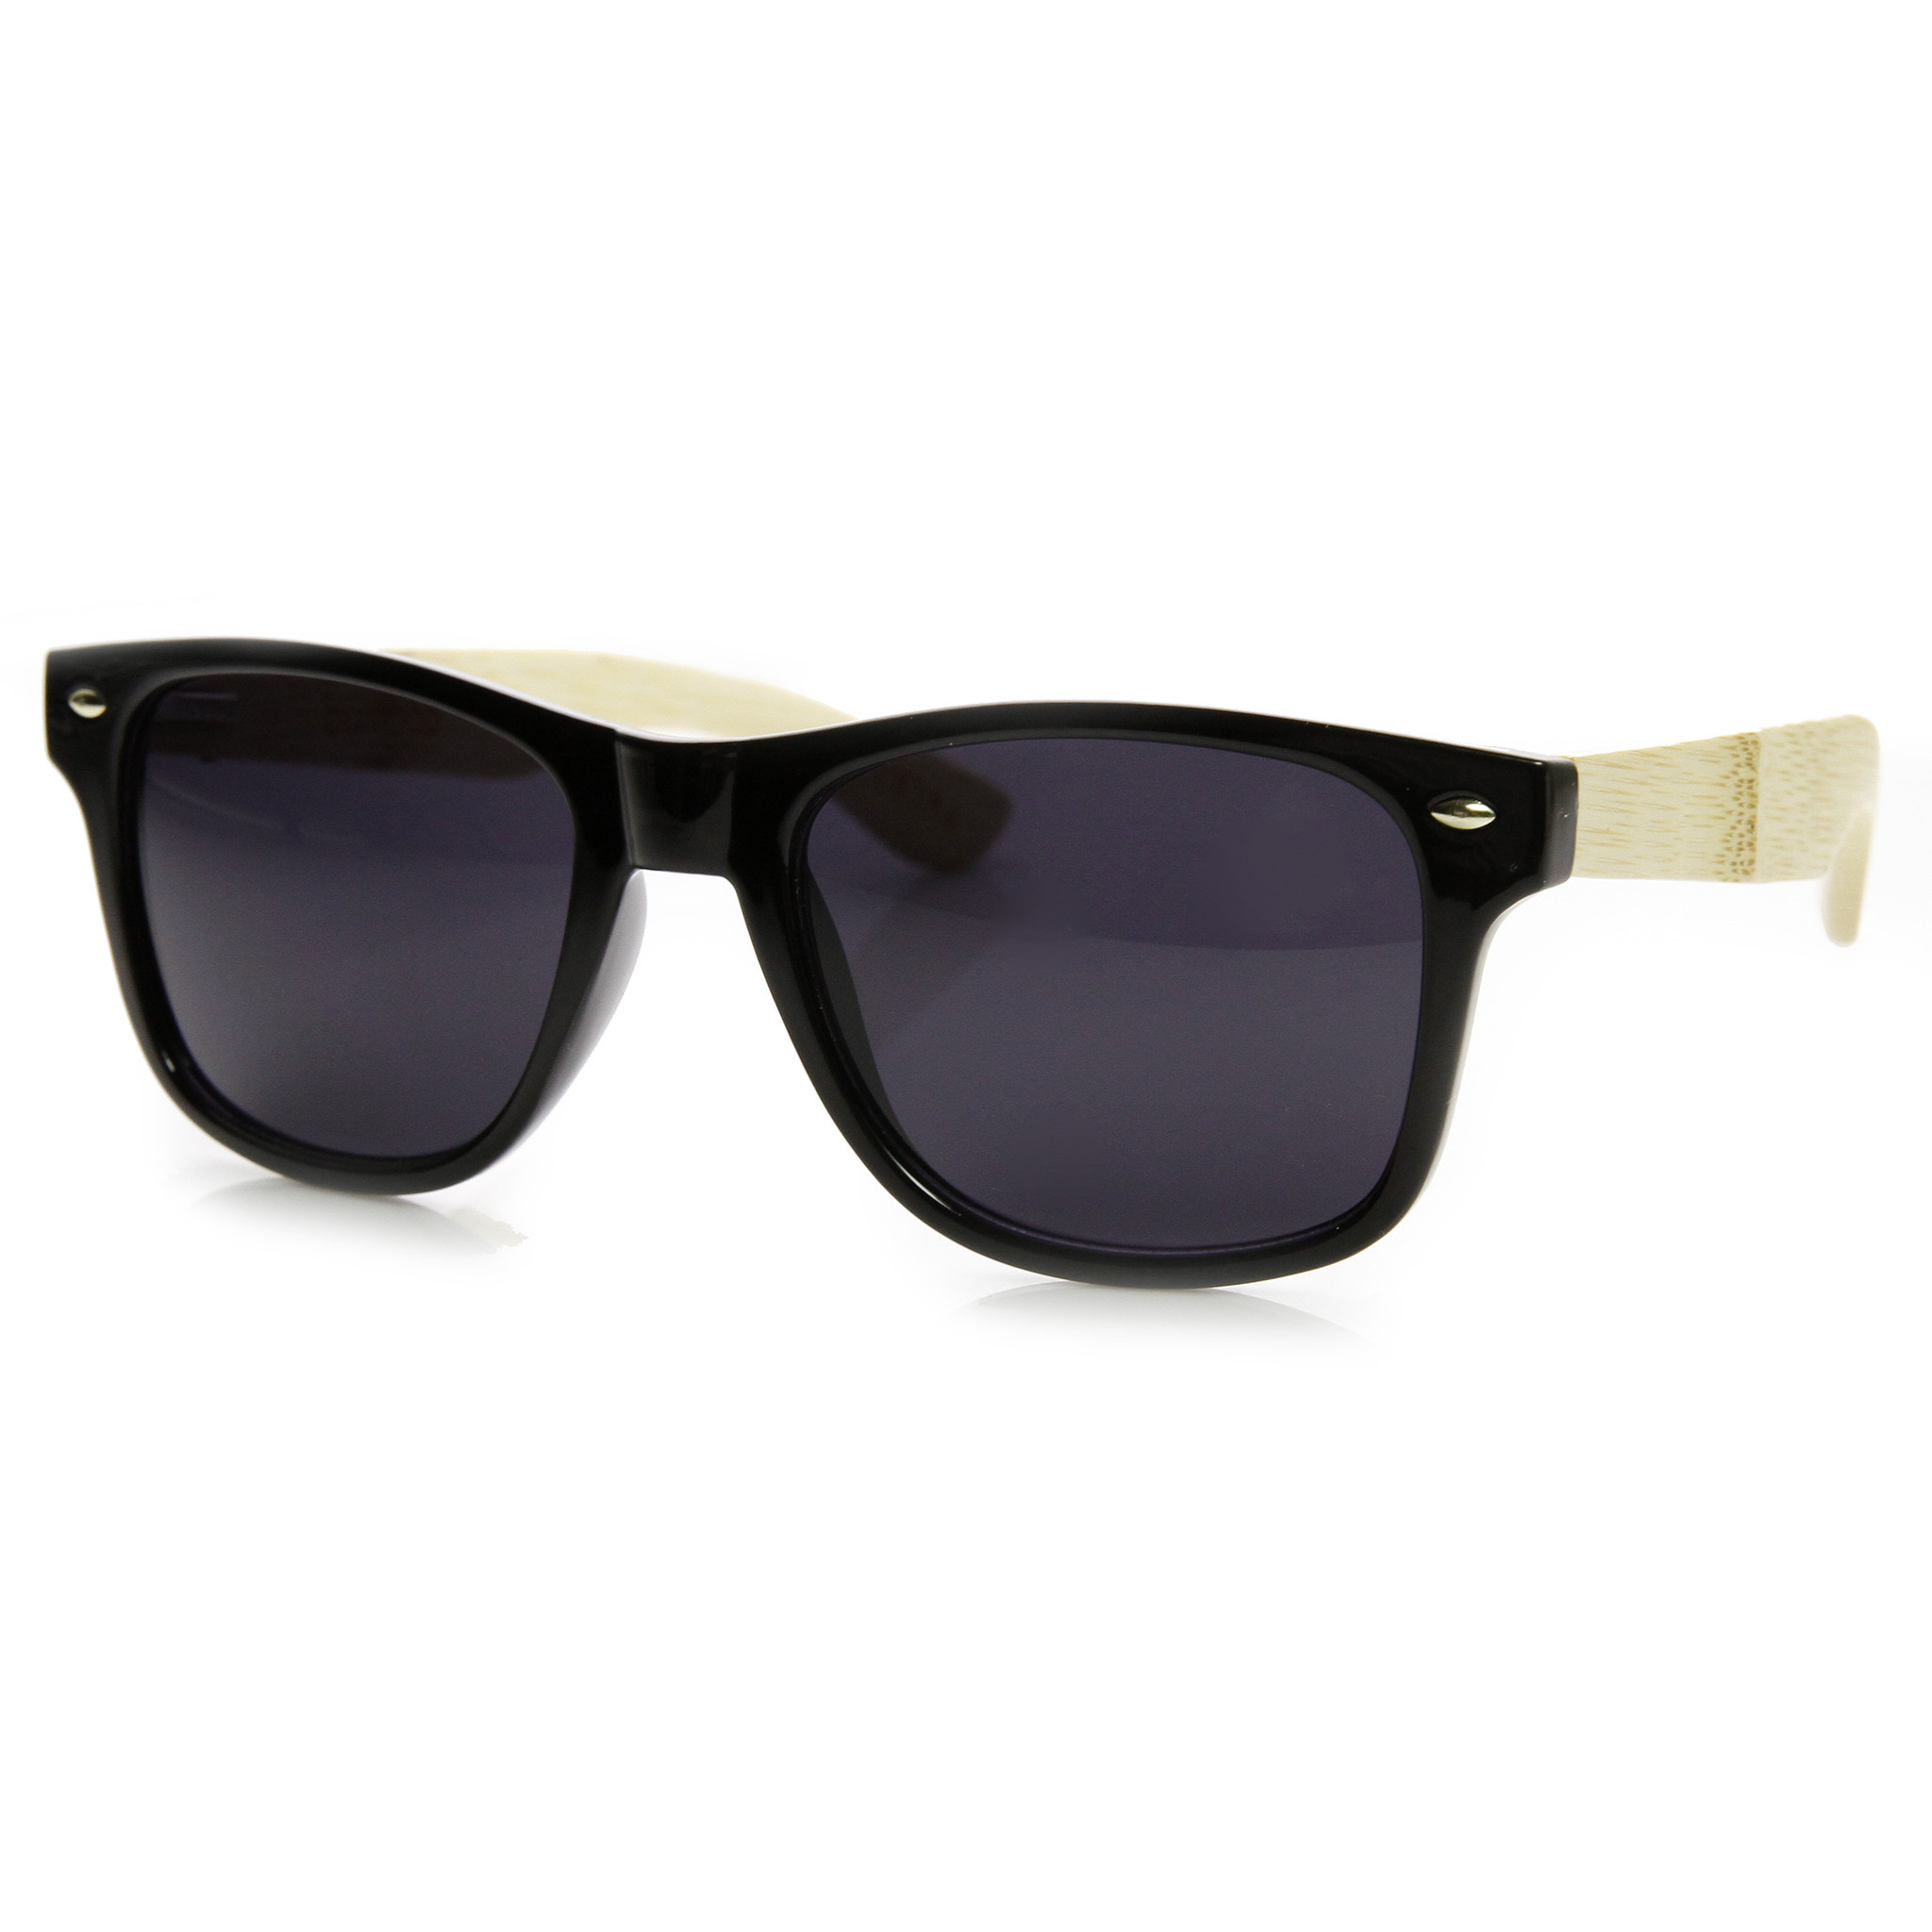 Eco Friendly Large Genuine Bamboo Wood Temple Wayfarer Sunglasses 9304